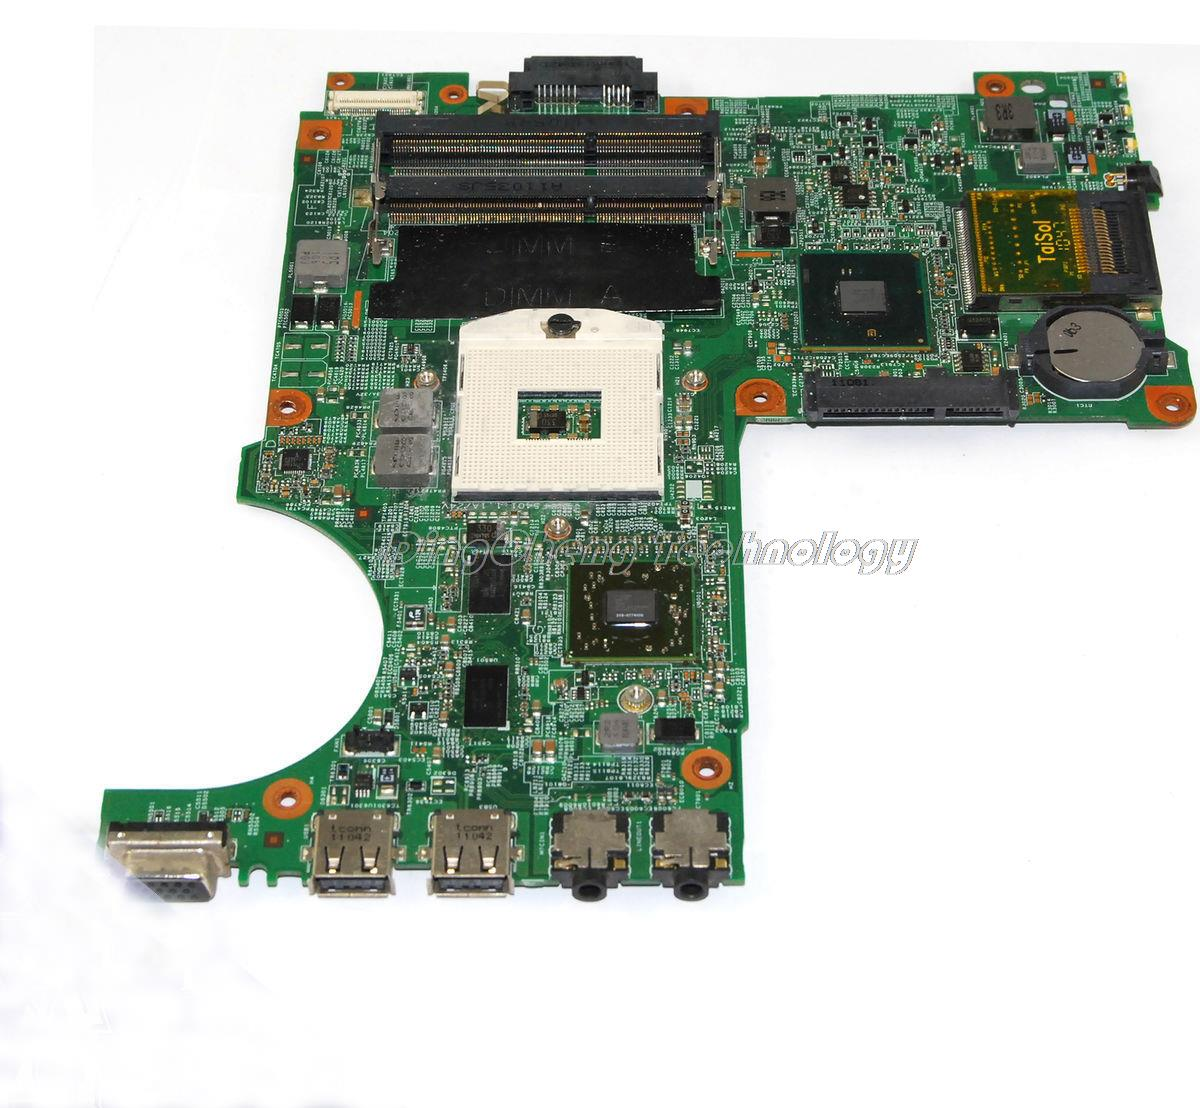 Laptop Motherboard for dell inspiron N4030 CN-03XMYG 48.4EK01.021 DDR3 HM57 non-integrated graphics cardLaptop Motherboard for dell inspiron N4030 CN-03XMYG 48.4EK01.021 DDR3 HM57 non-integrated graphics card